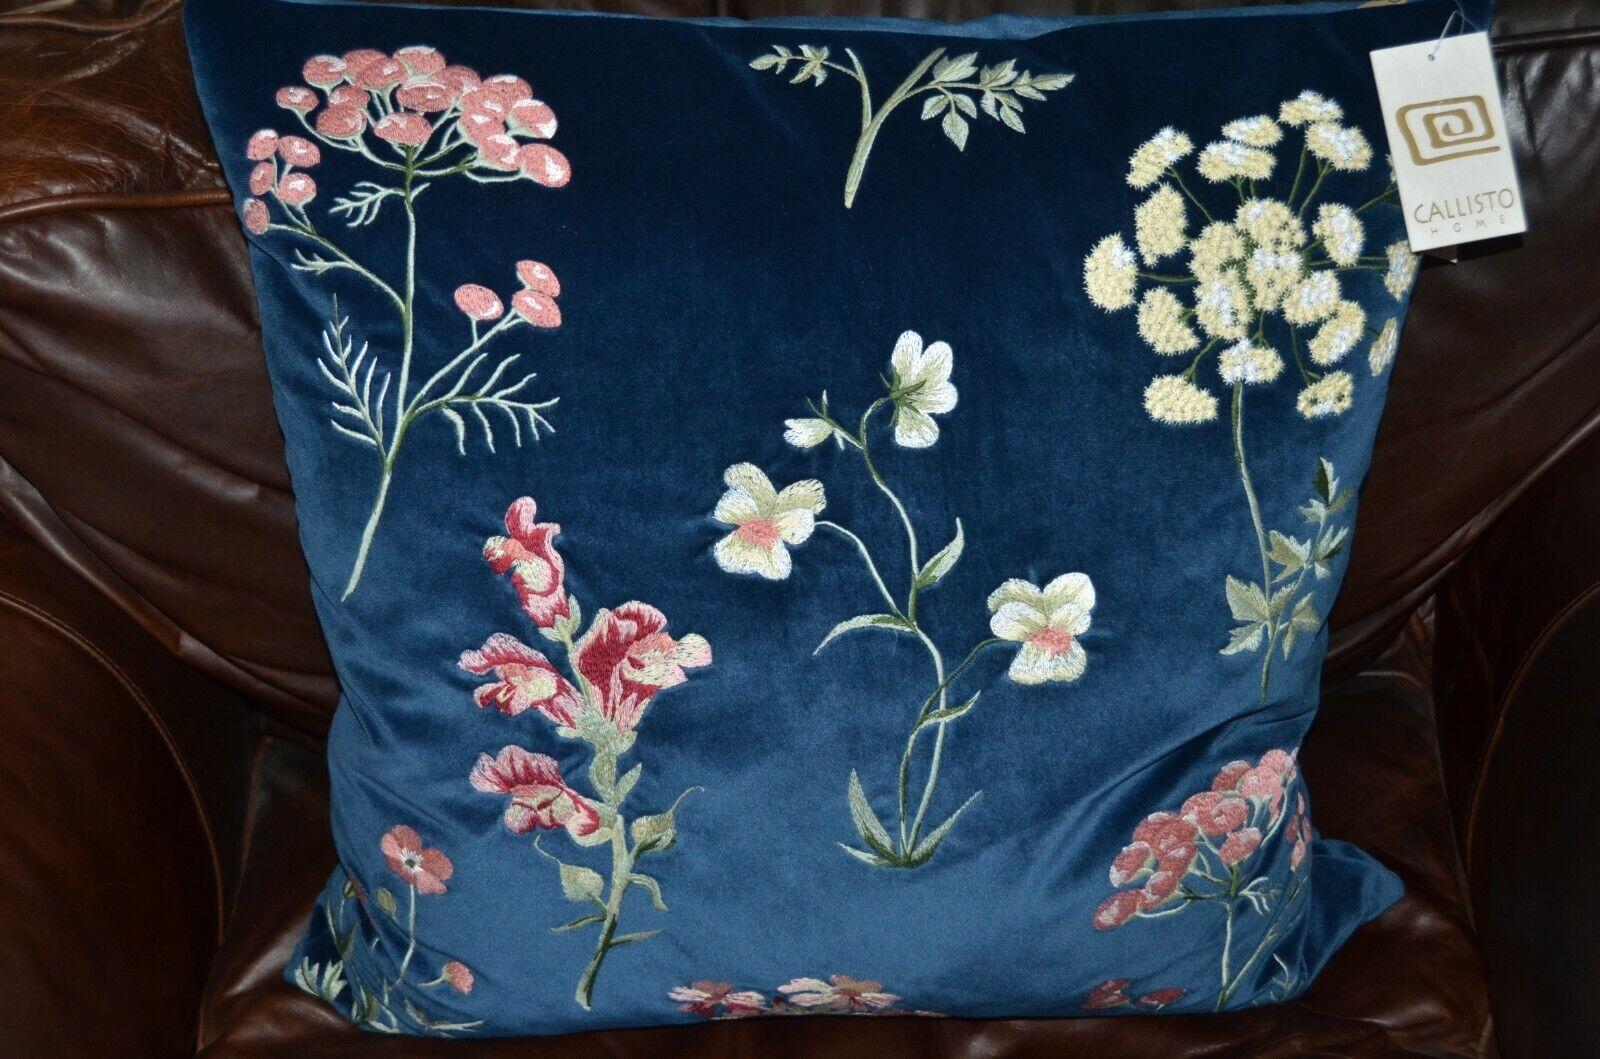 East Urban Home Floral Exotic Flower Petal Dance Pillow For Sale Online Ebay